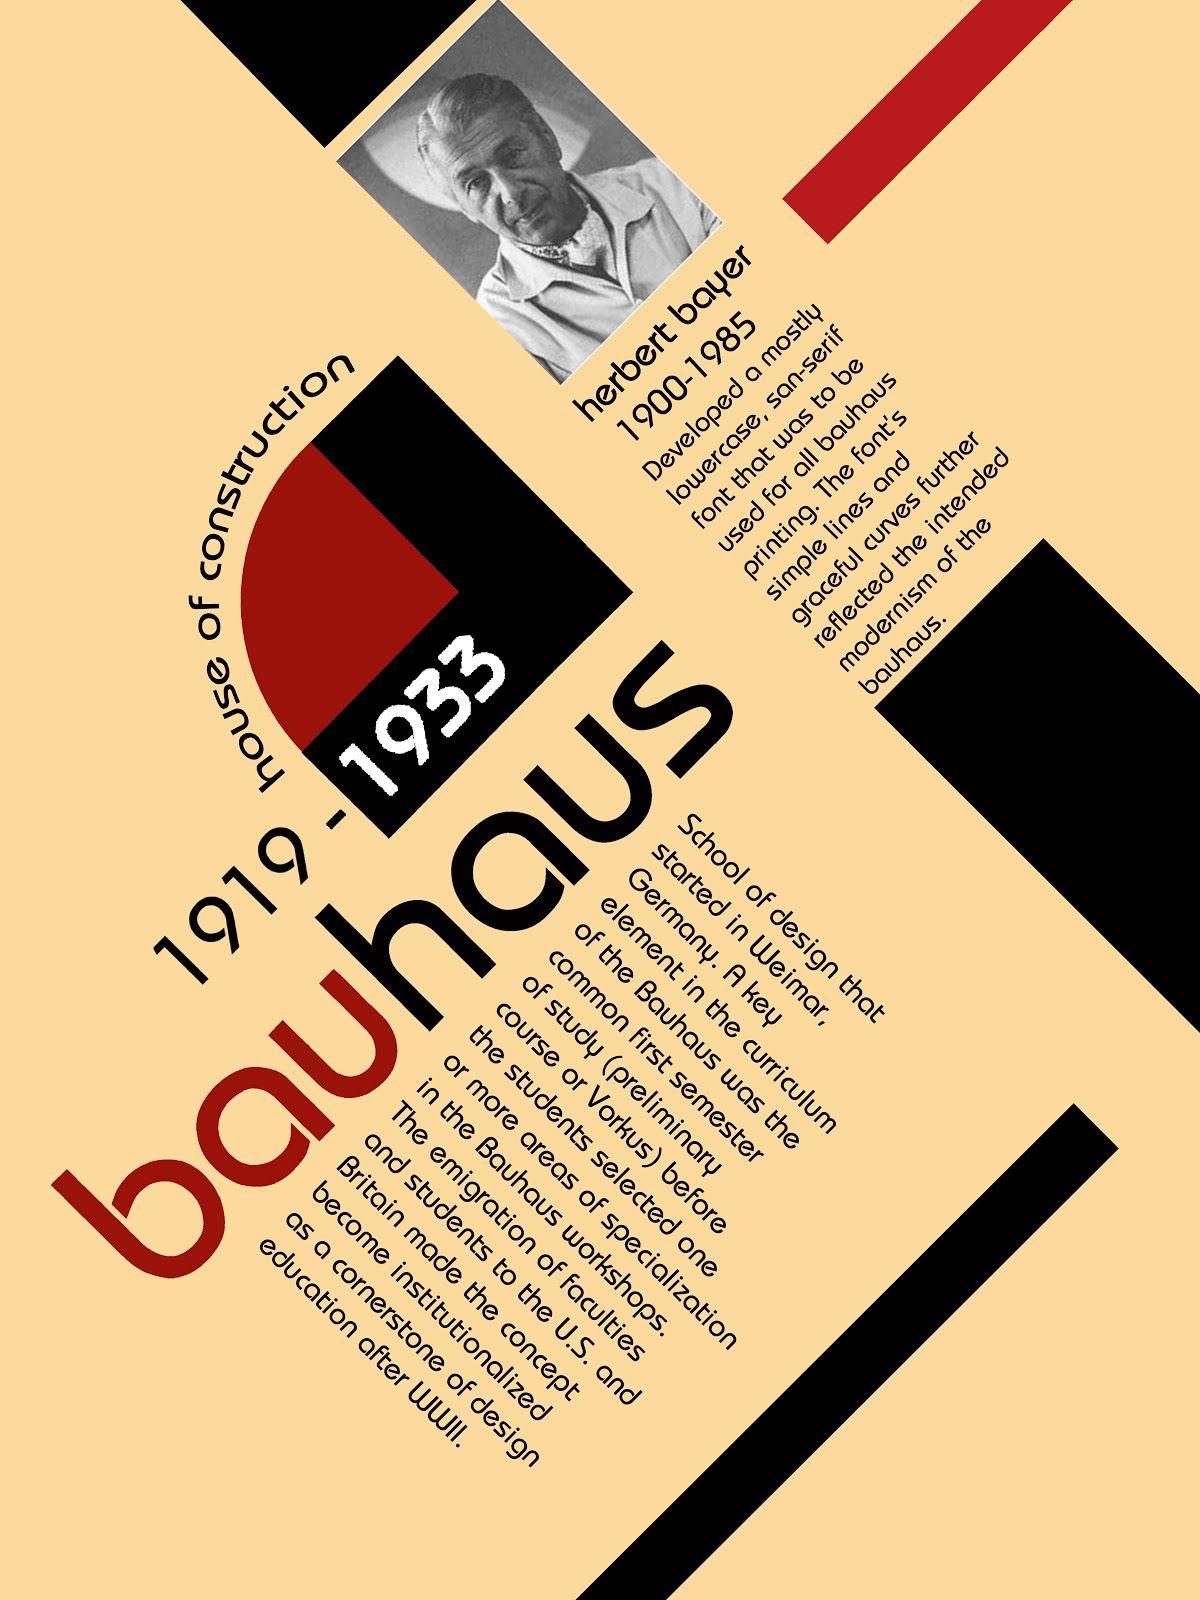 Poster design history - Bauhaus Graphic Design Poster Bauhaus Graphic Design Poster History